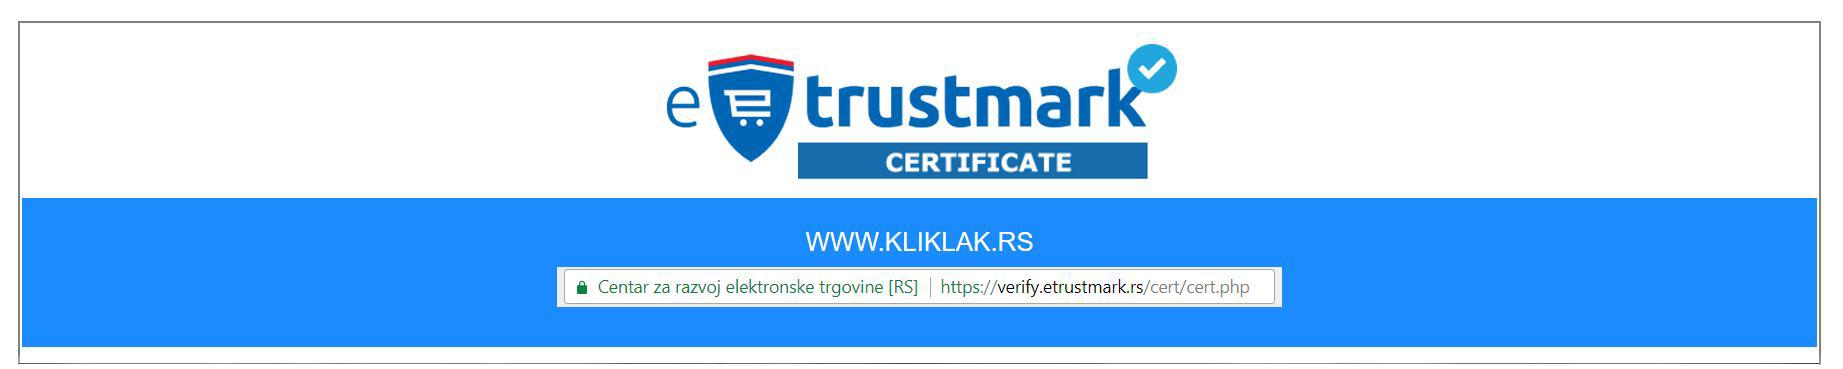 kliklak-sertifikovan-online-prodavac